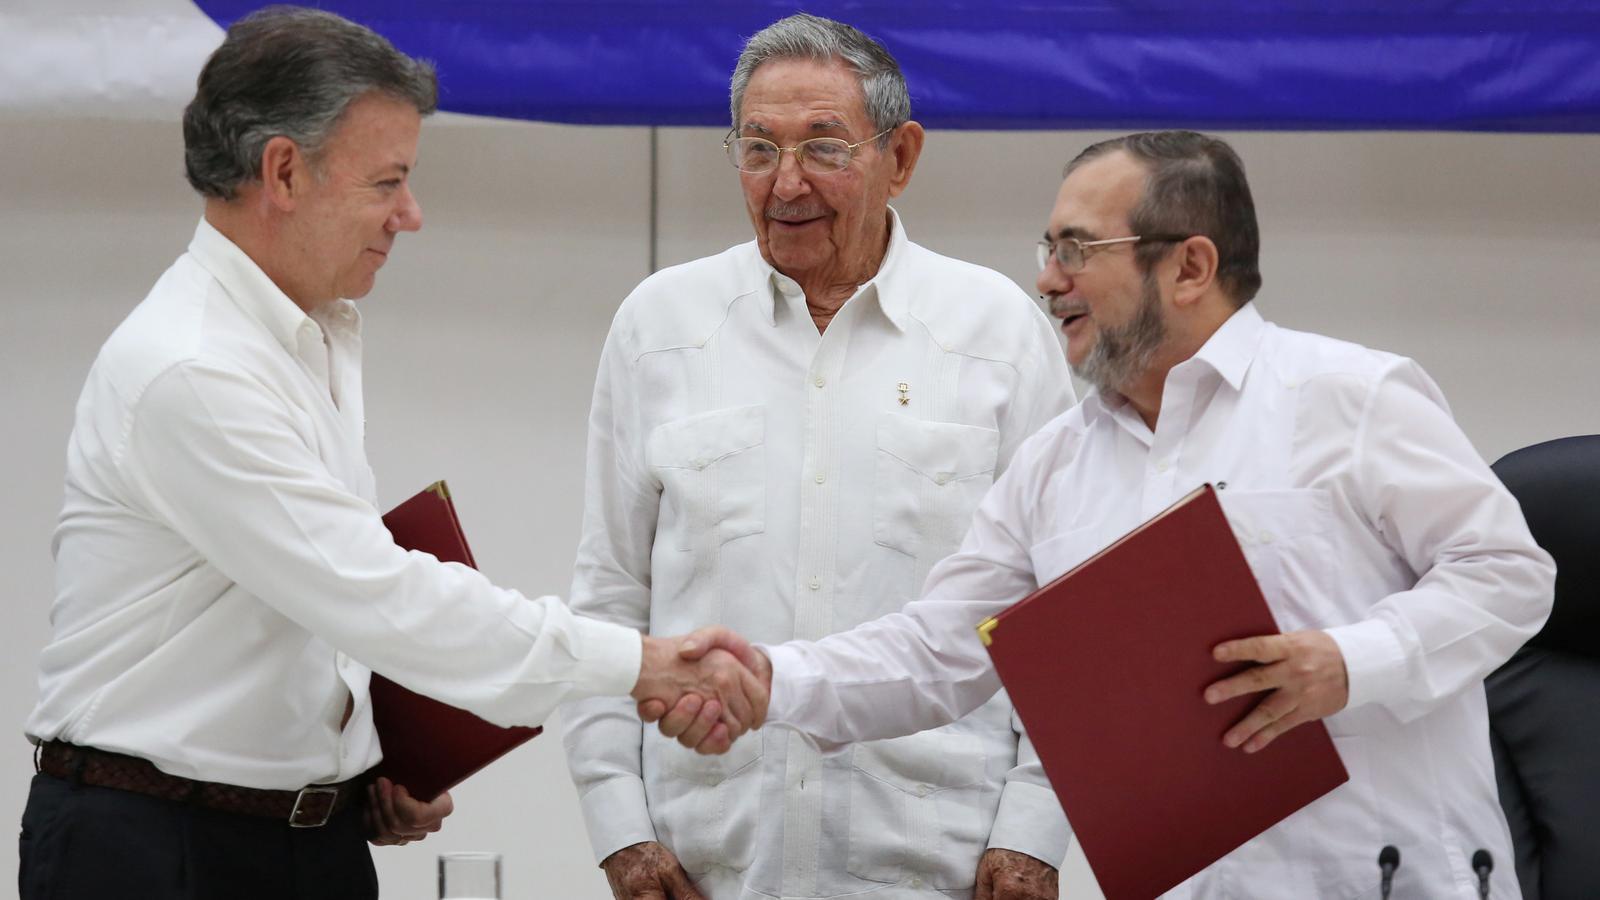 Timochenko serà el candidat presidencial de les FARC en les eleccions presidencials del 2018